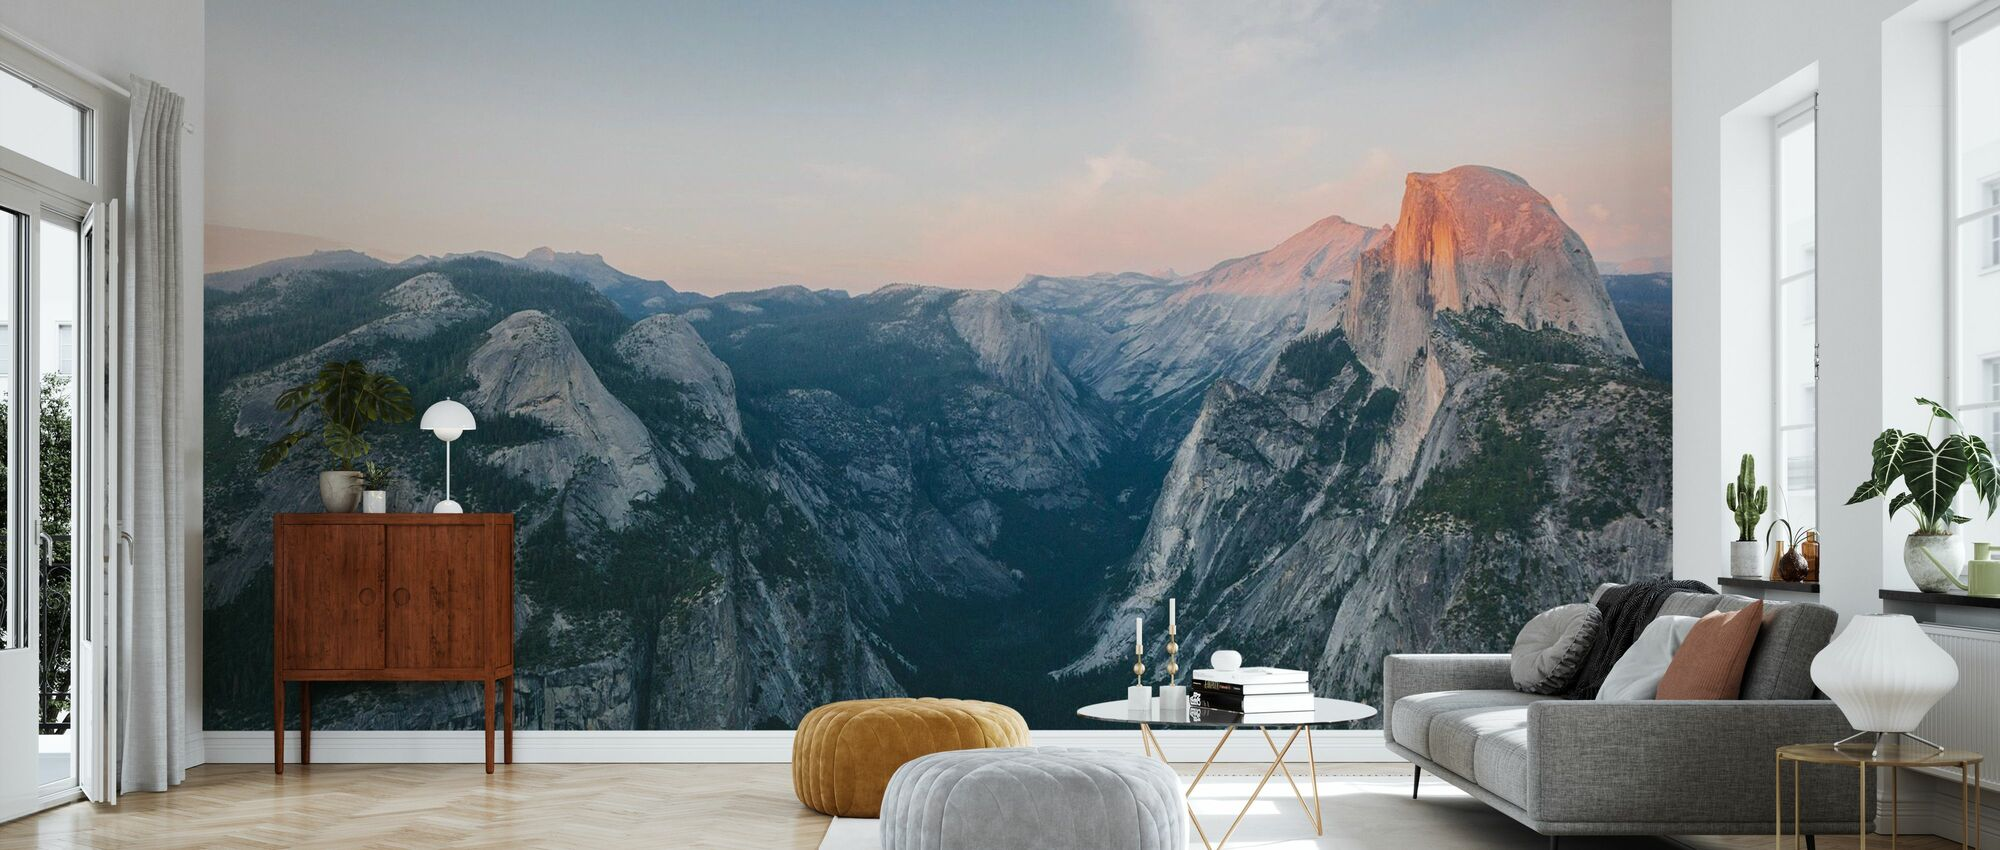 Half Dome, Yosemite National Park - Wallpaper - Living Room